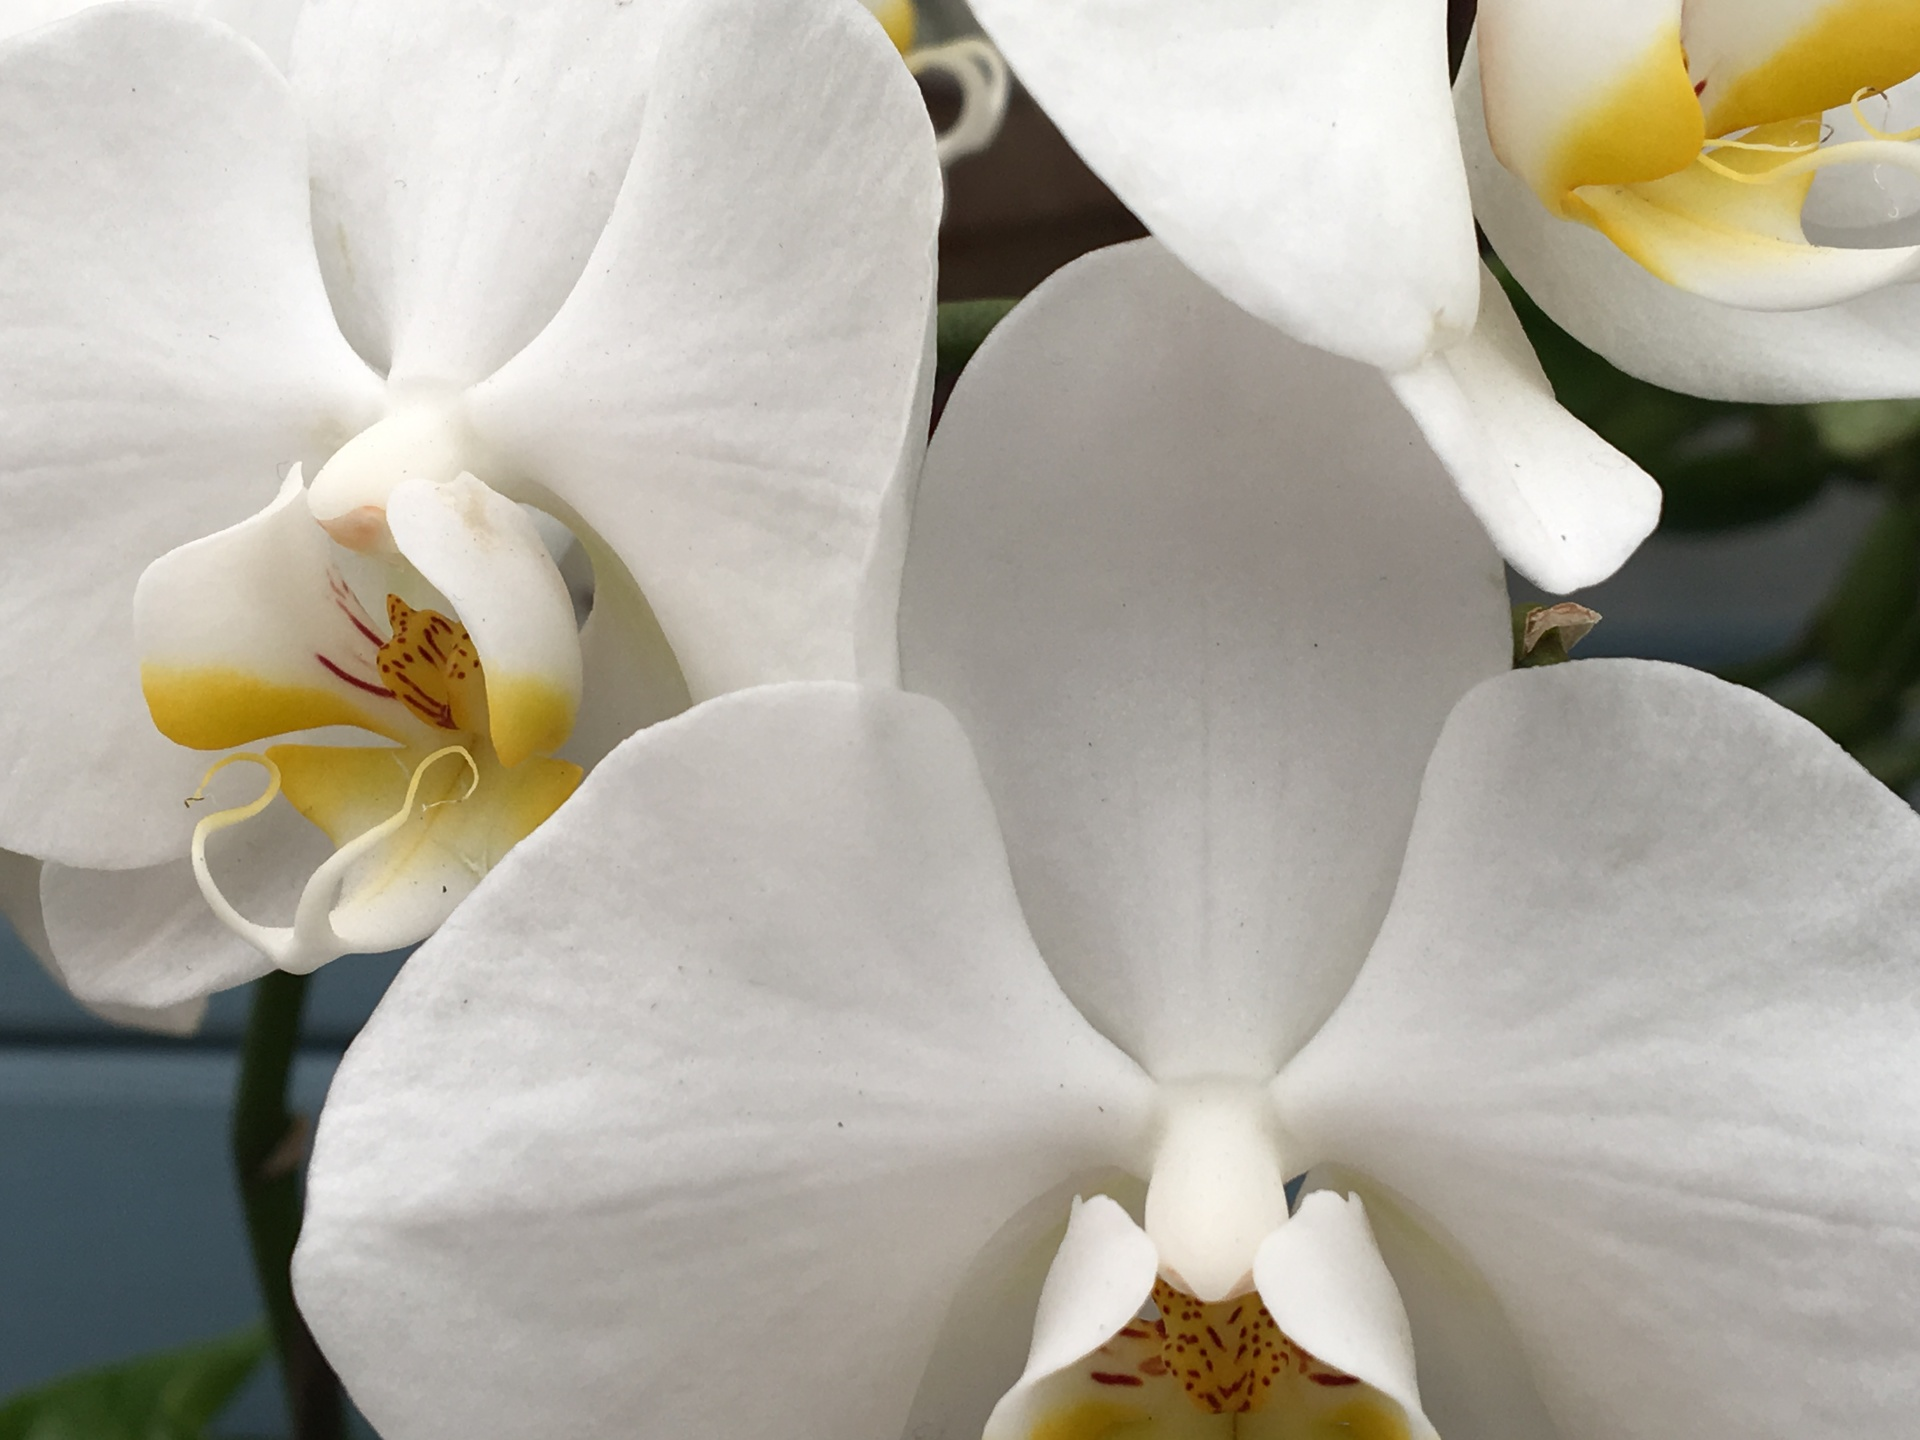 Orchid 3, Digital Still-Life Photography by Artist Mindy Lichter. MLICHTER fINE ART dESIGN